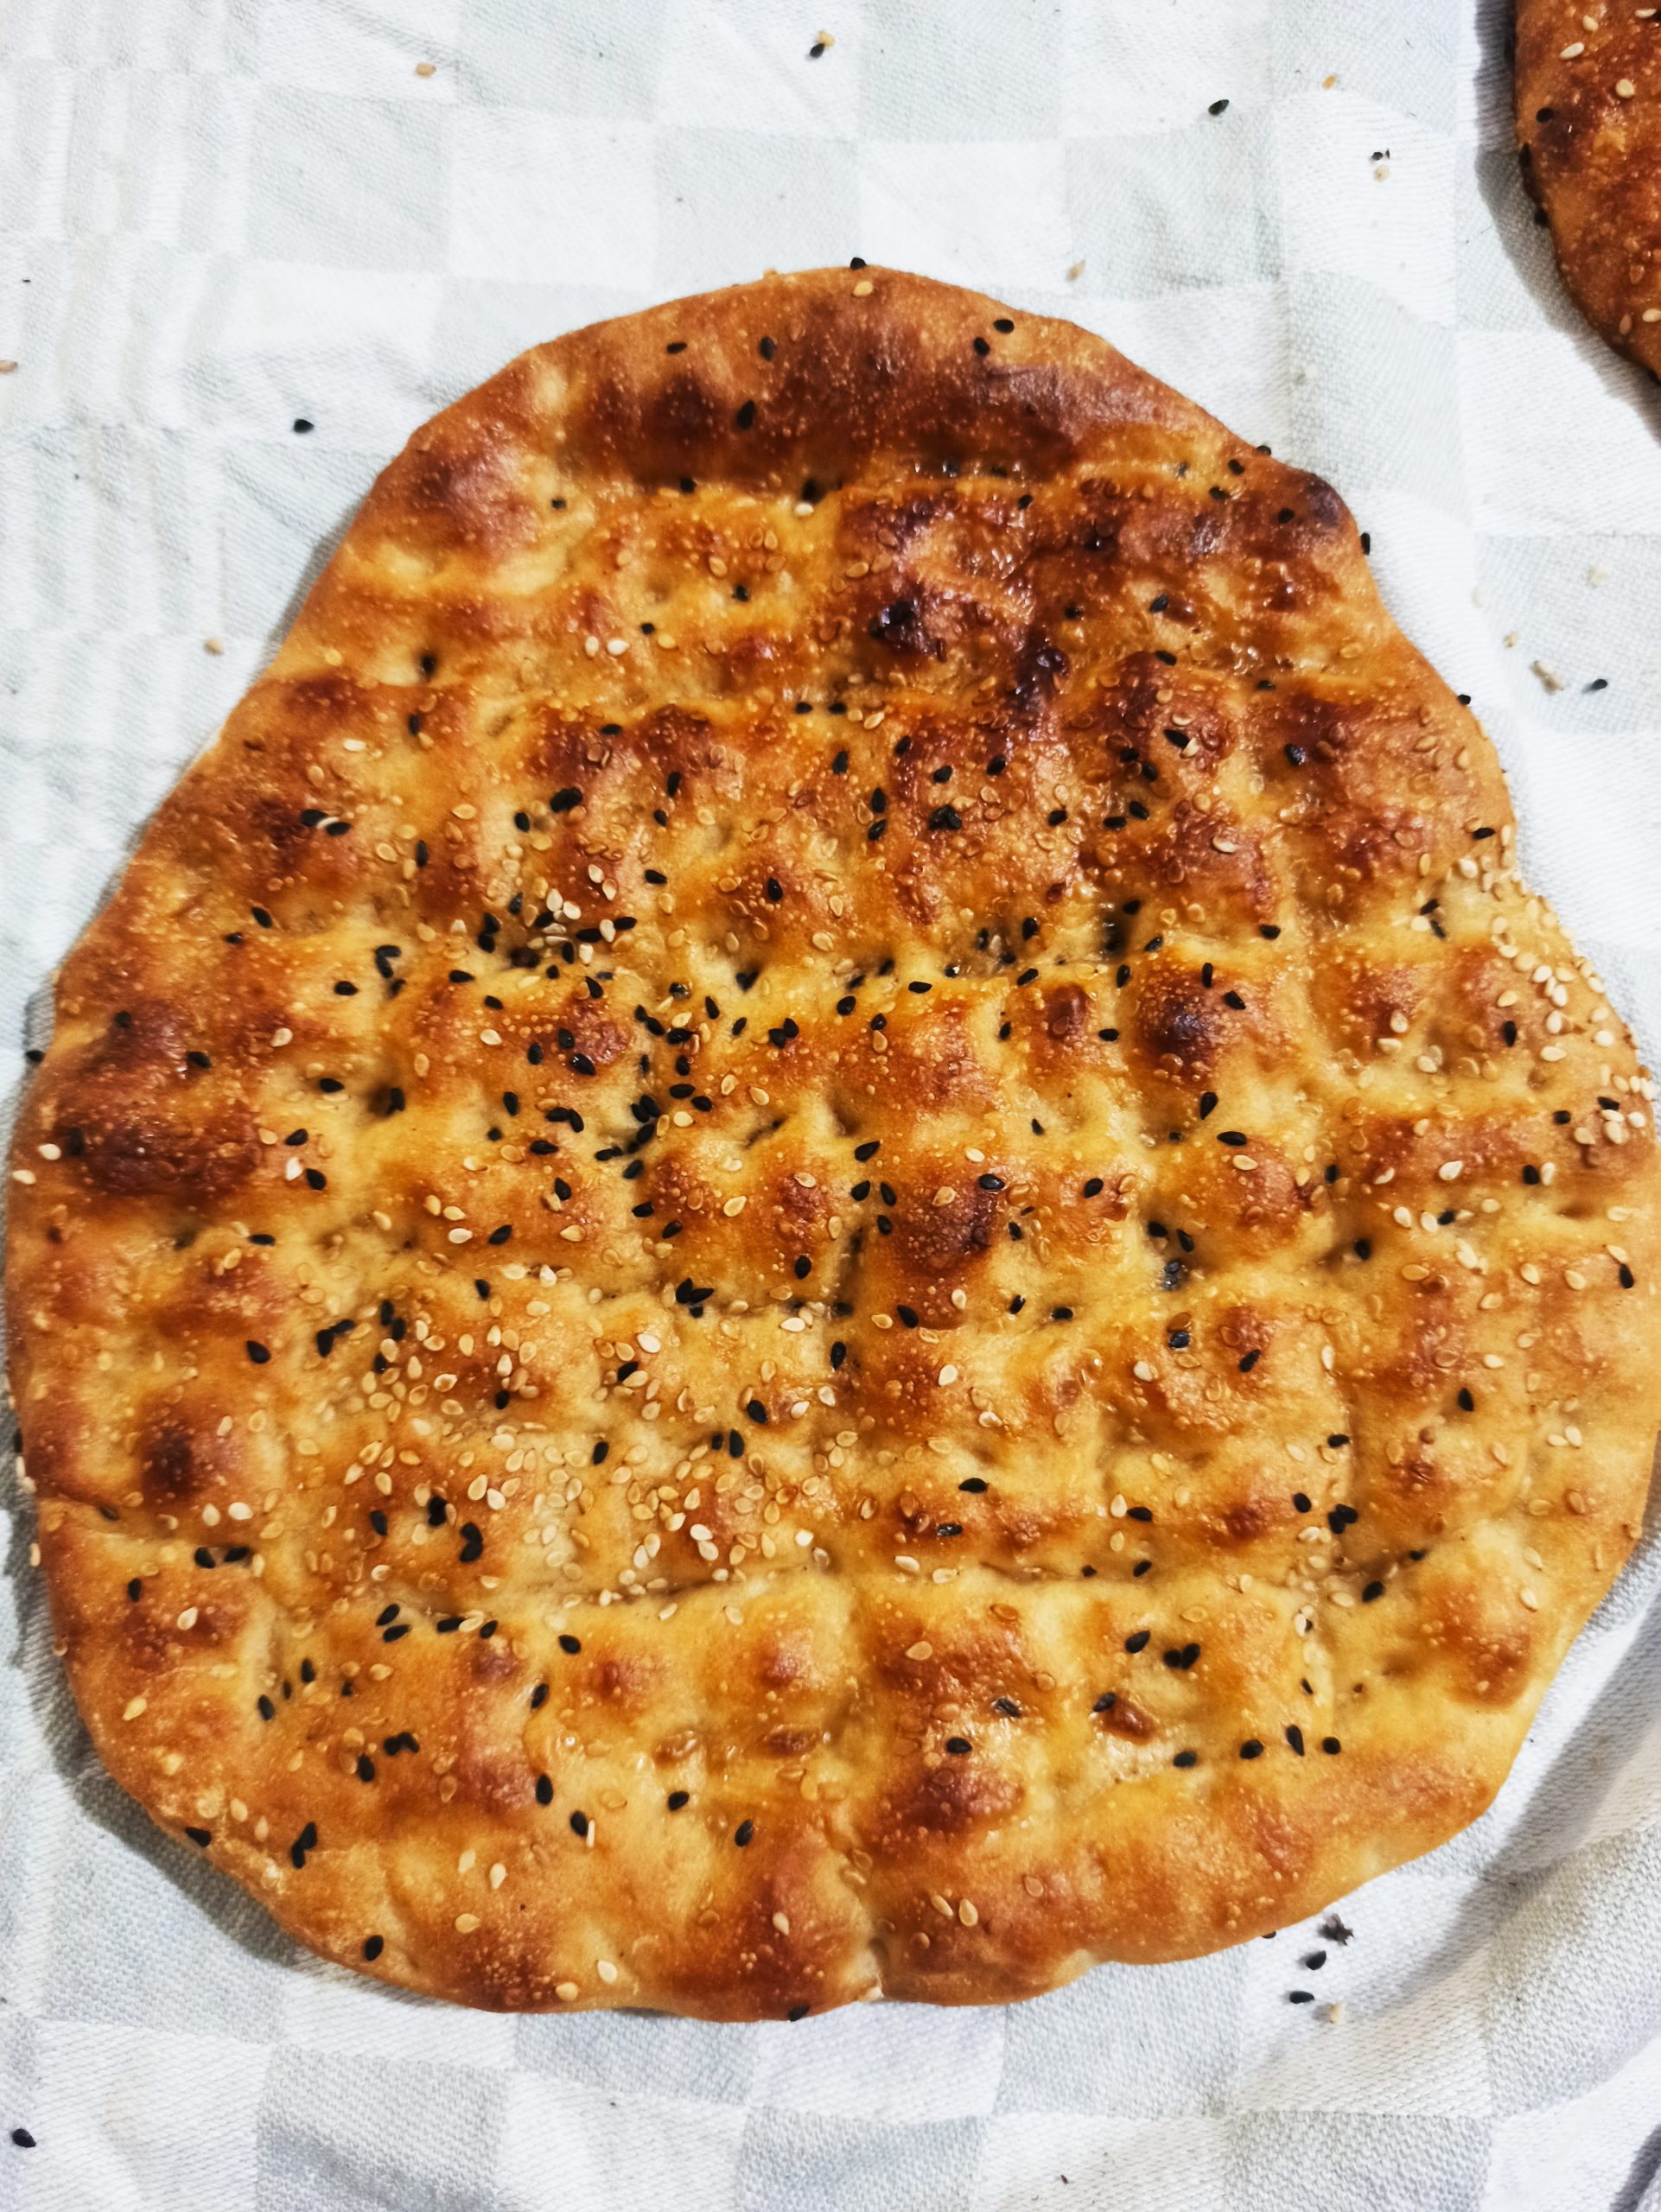 pidé pain turc turkish bread